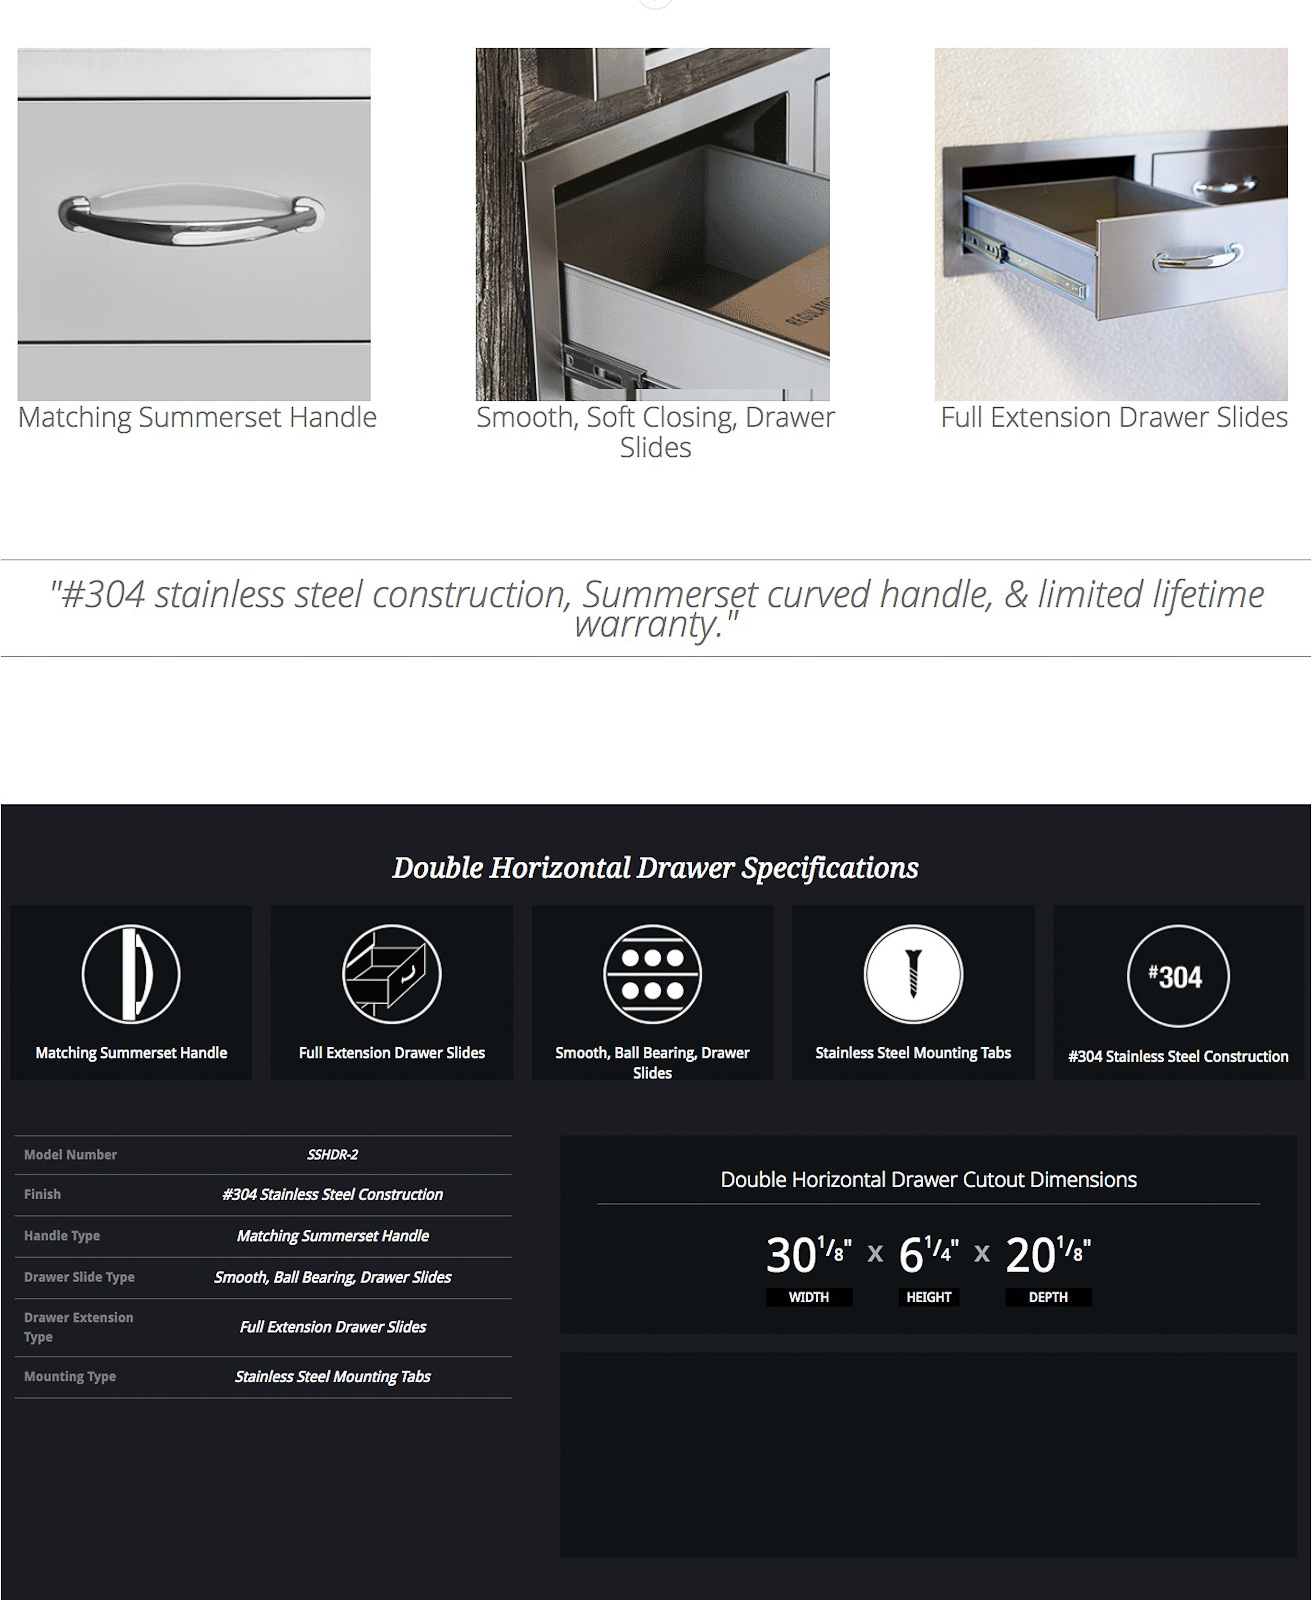 summerset-double-horizontal-drawer-storage-drawers-sshdr-2.jpg